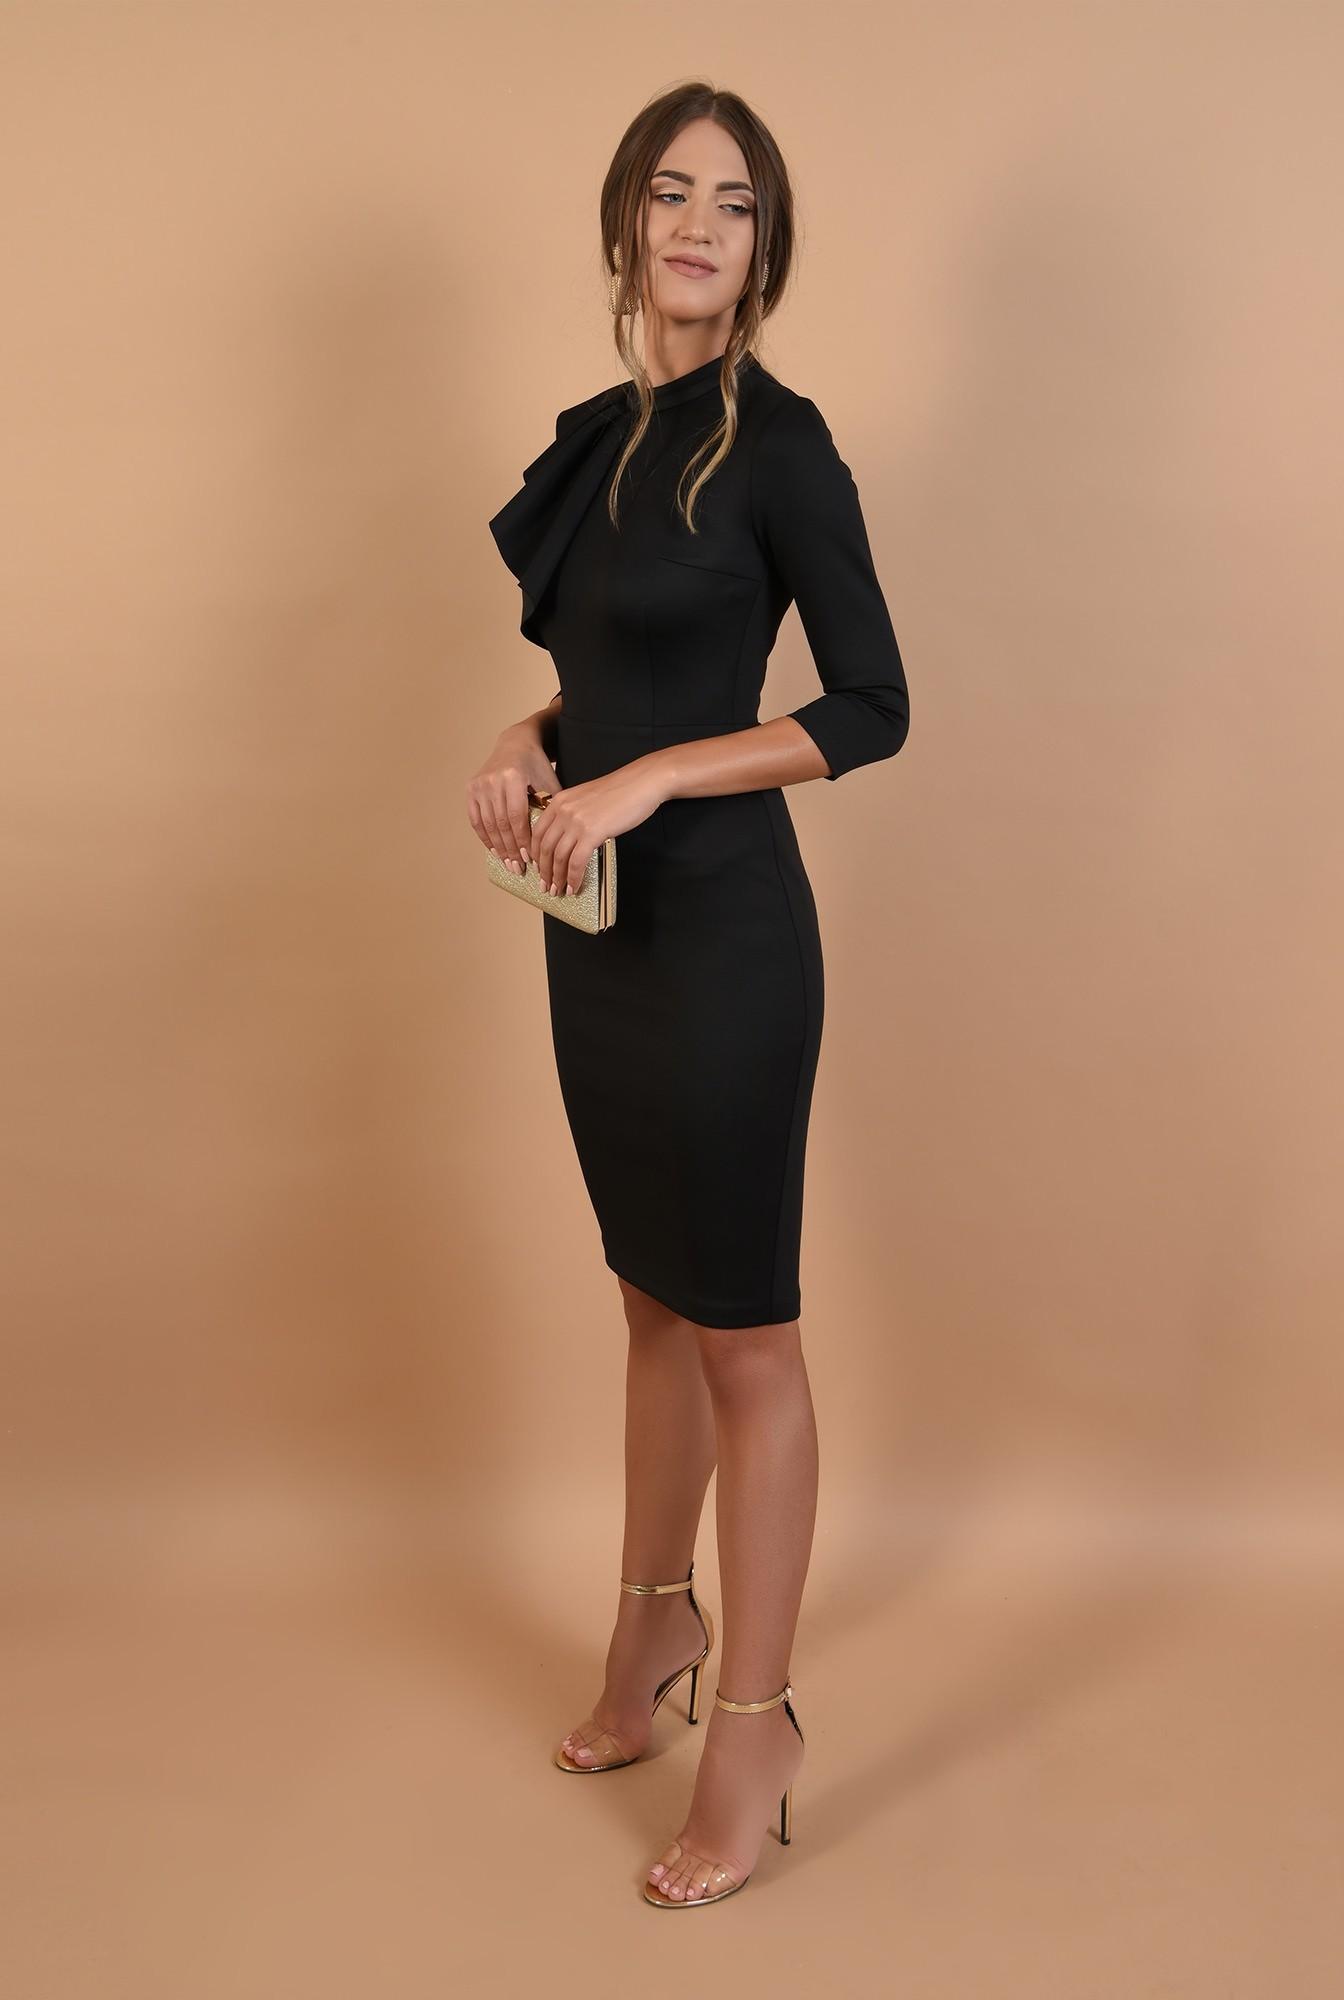 3 - 360 - rochie conica, neagra, midi, aplicatie cu pliuri, guler inalt, Poema